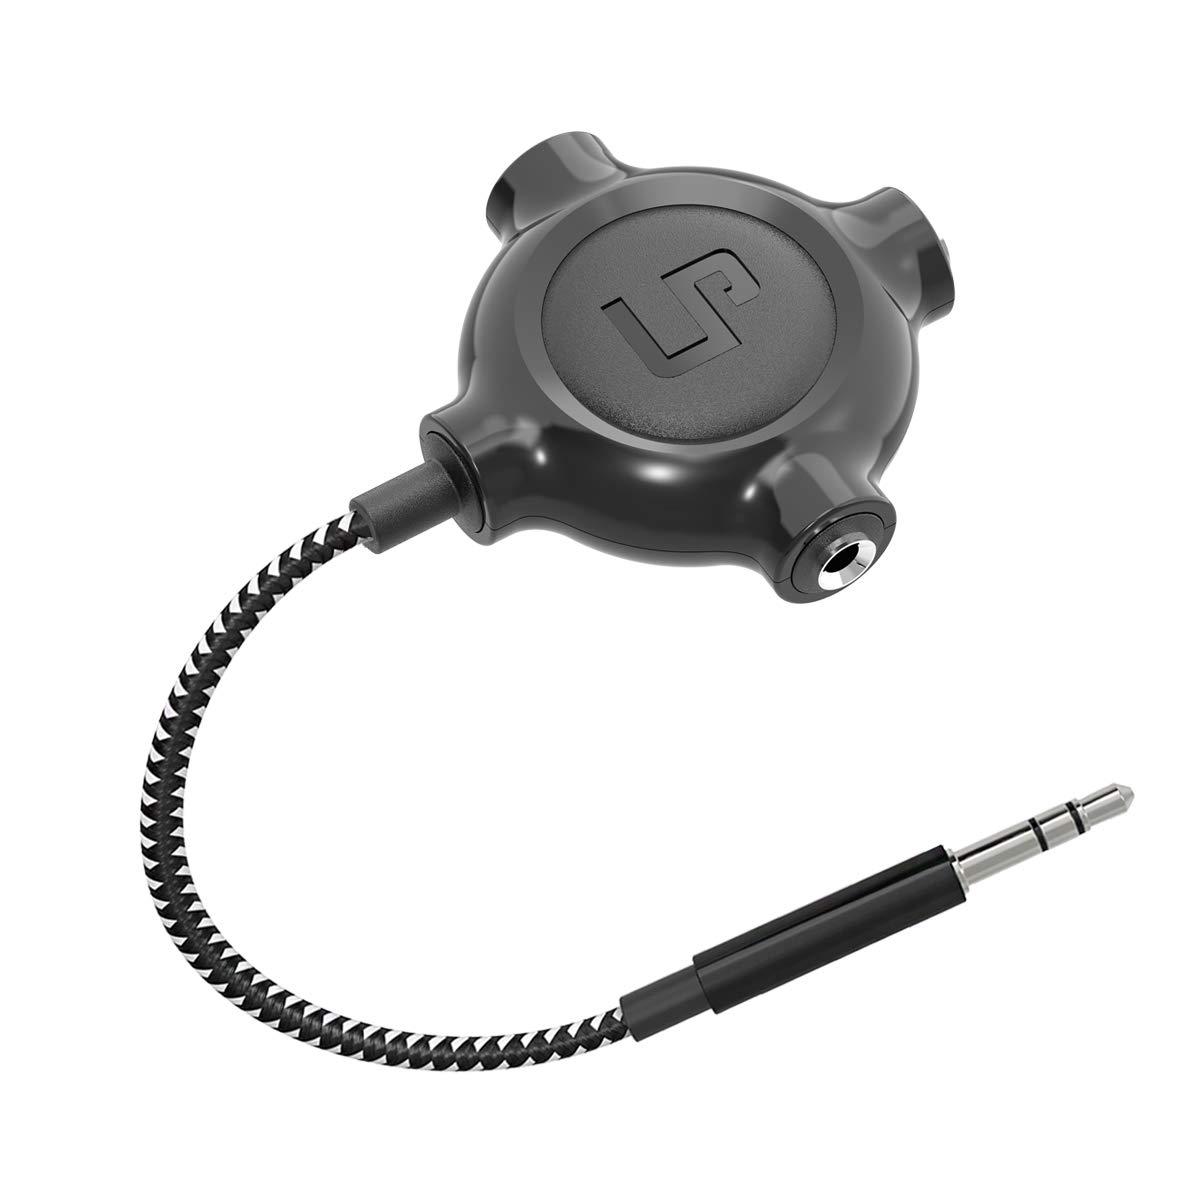 LP Headphone Splitter, Nylon-Braided 3.5mm Audio Stereo Splitter, Male to 3 Female Ports for MacBook, Mac, iPad, iPhone(≤6), iPod, Tablet, Laptop, PC, Earphone, Kindle, MP3 Player, Speaker & More